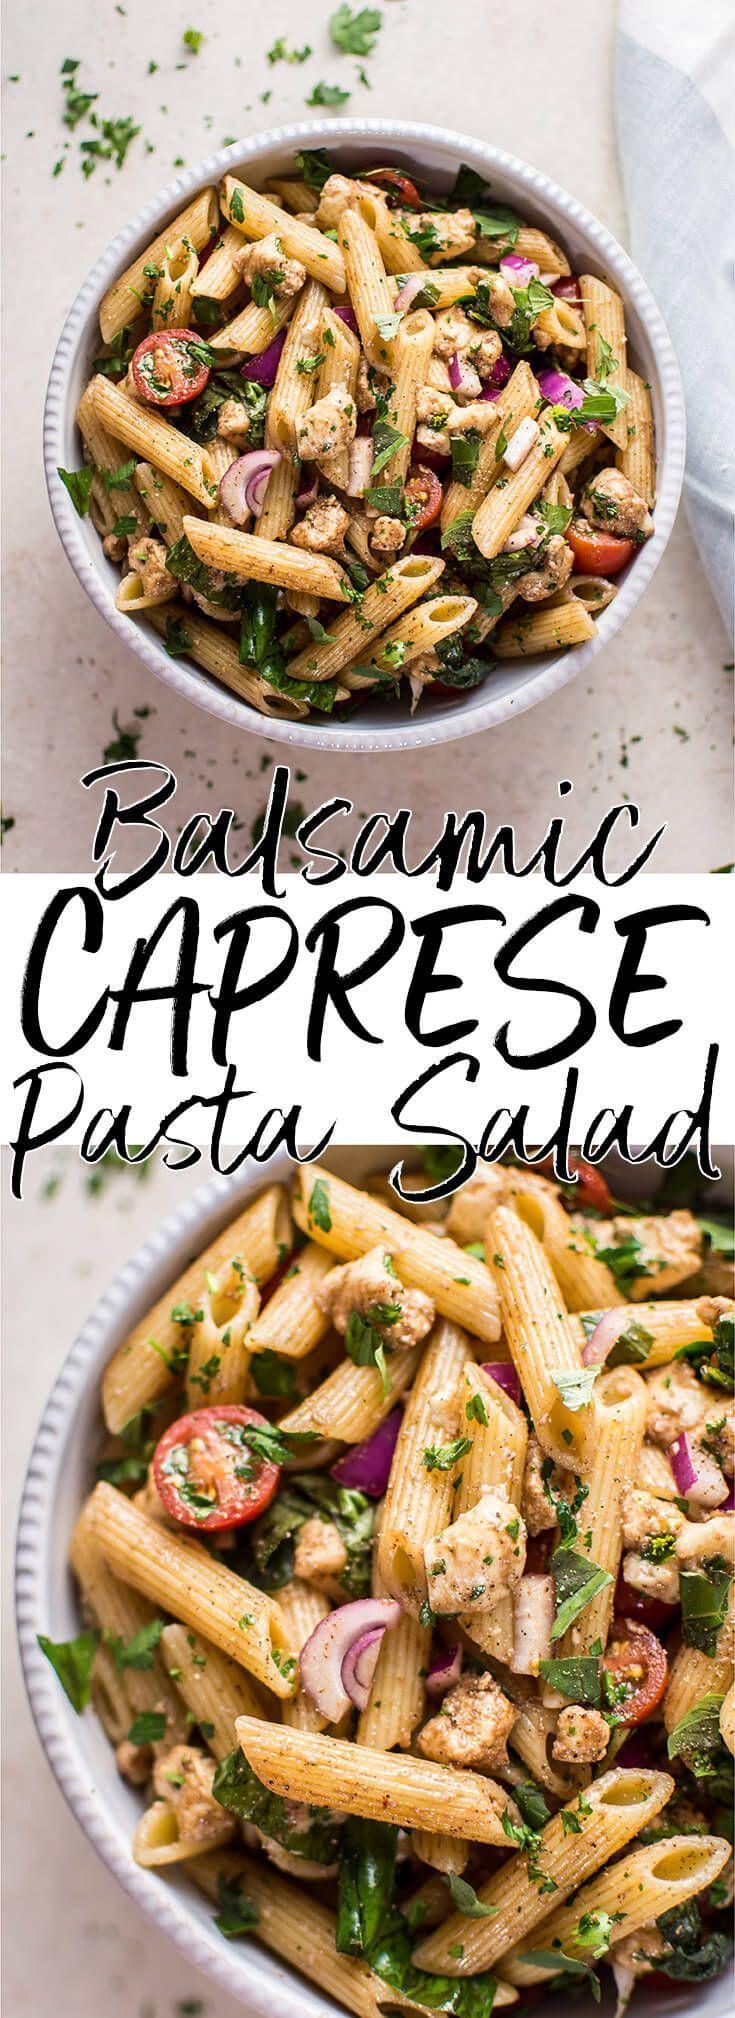 Balsamic Caprese Pasta Salad